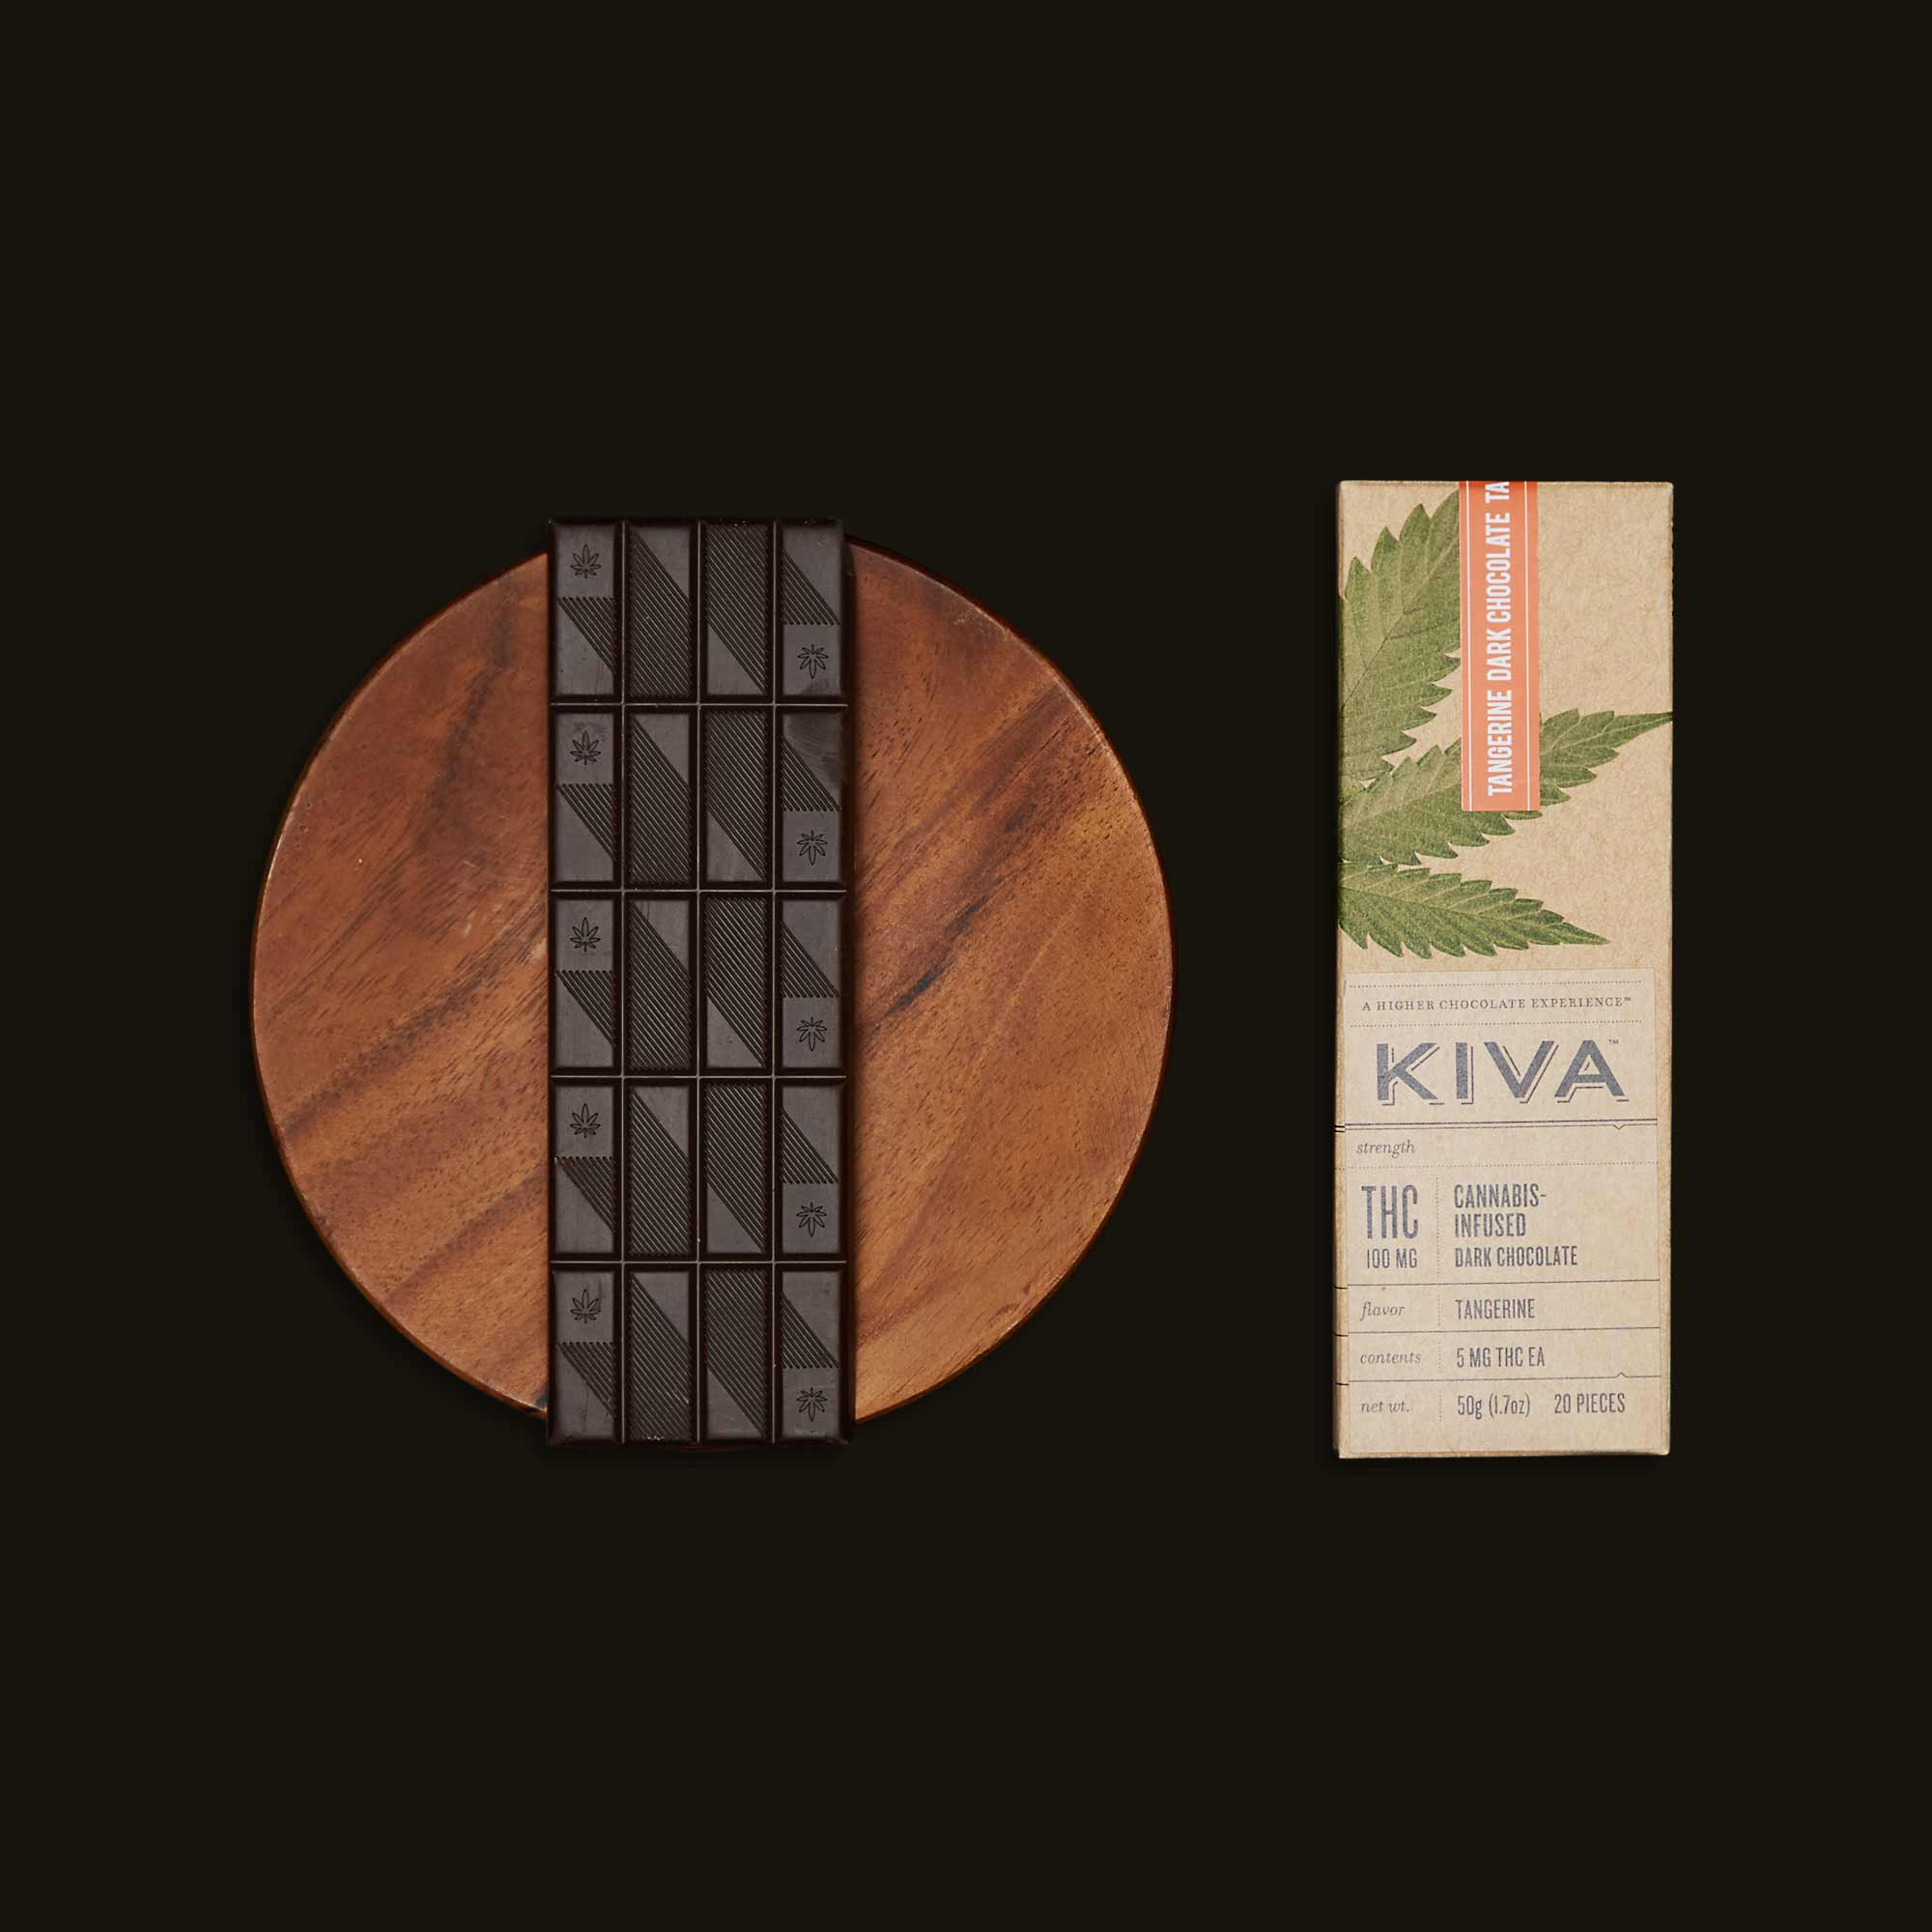 Medium Edible by Kiva Confections